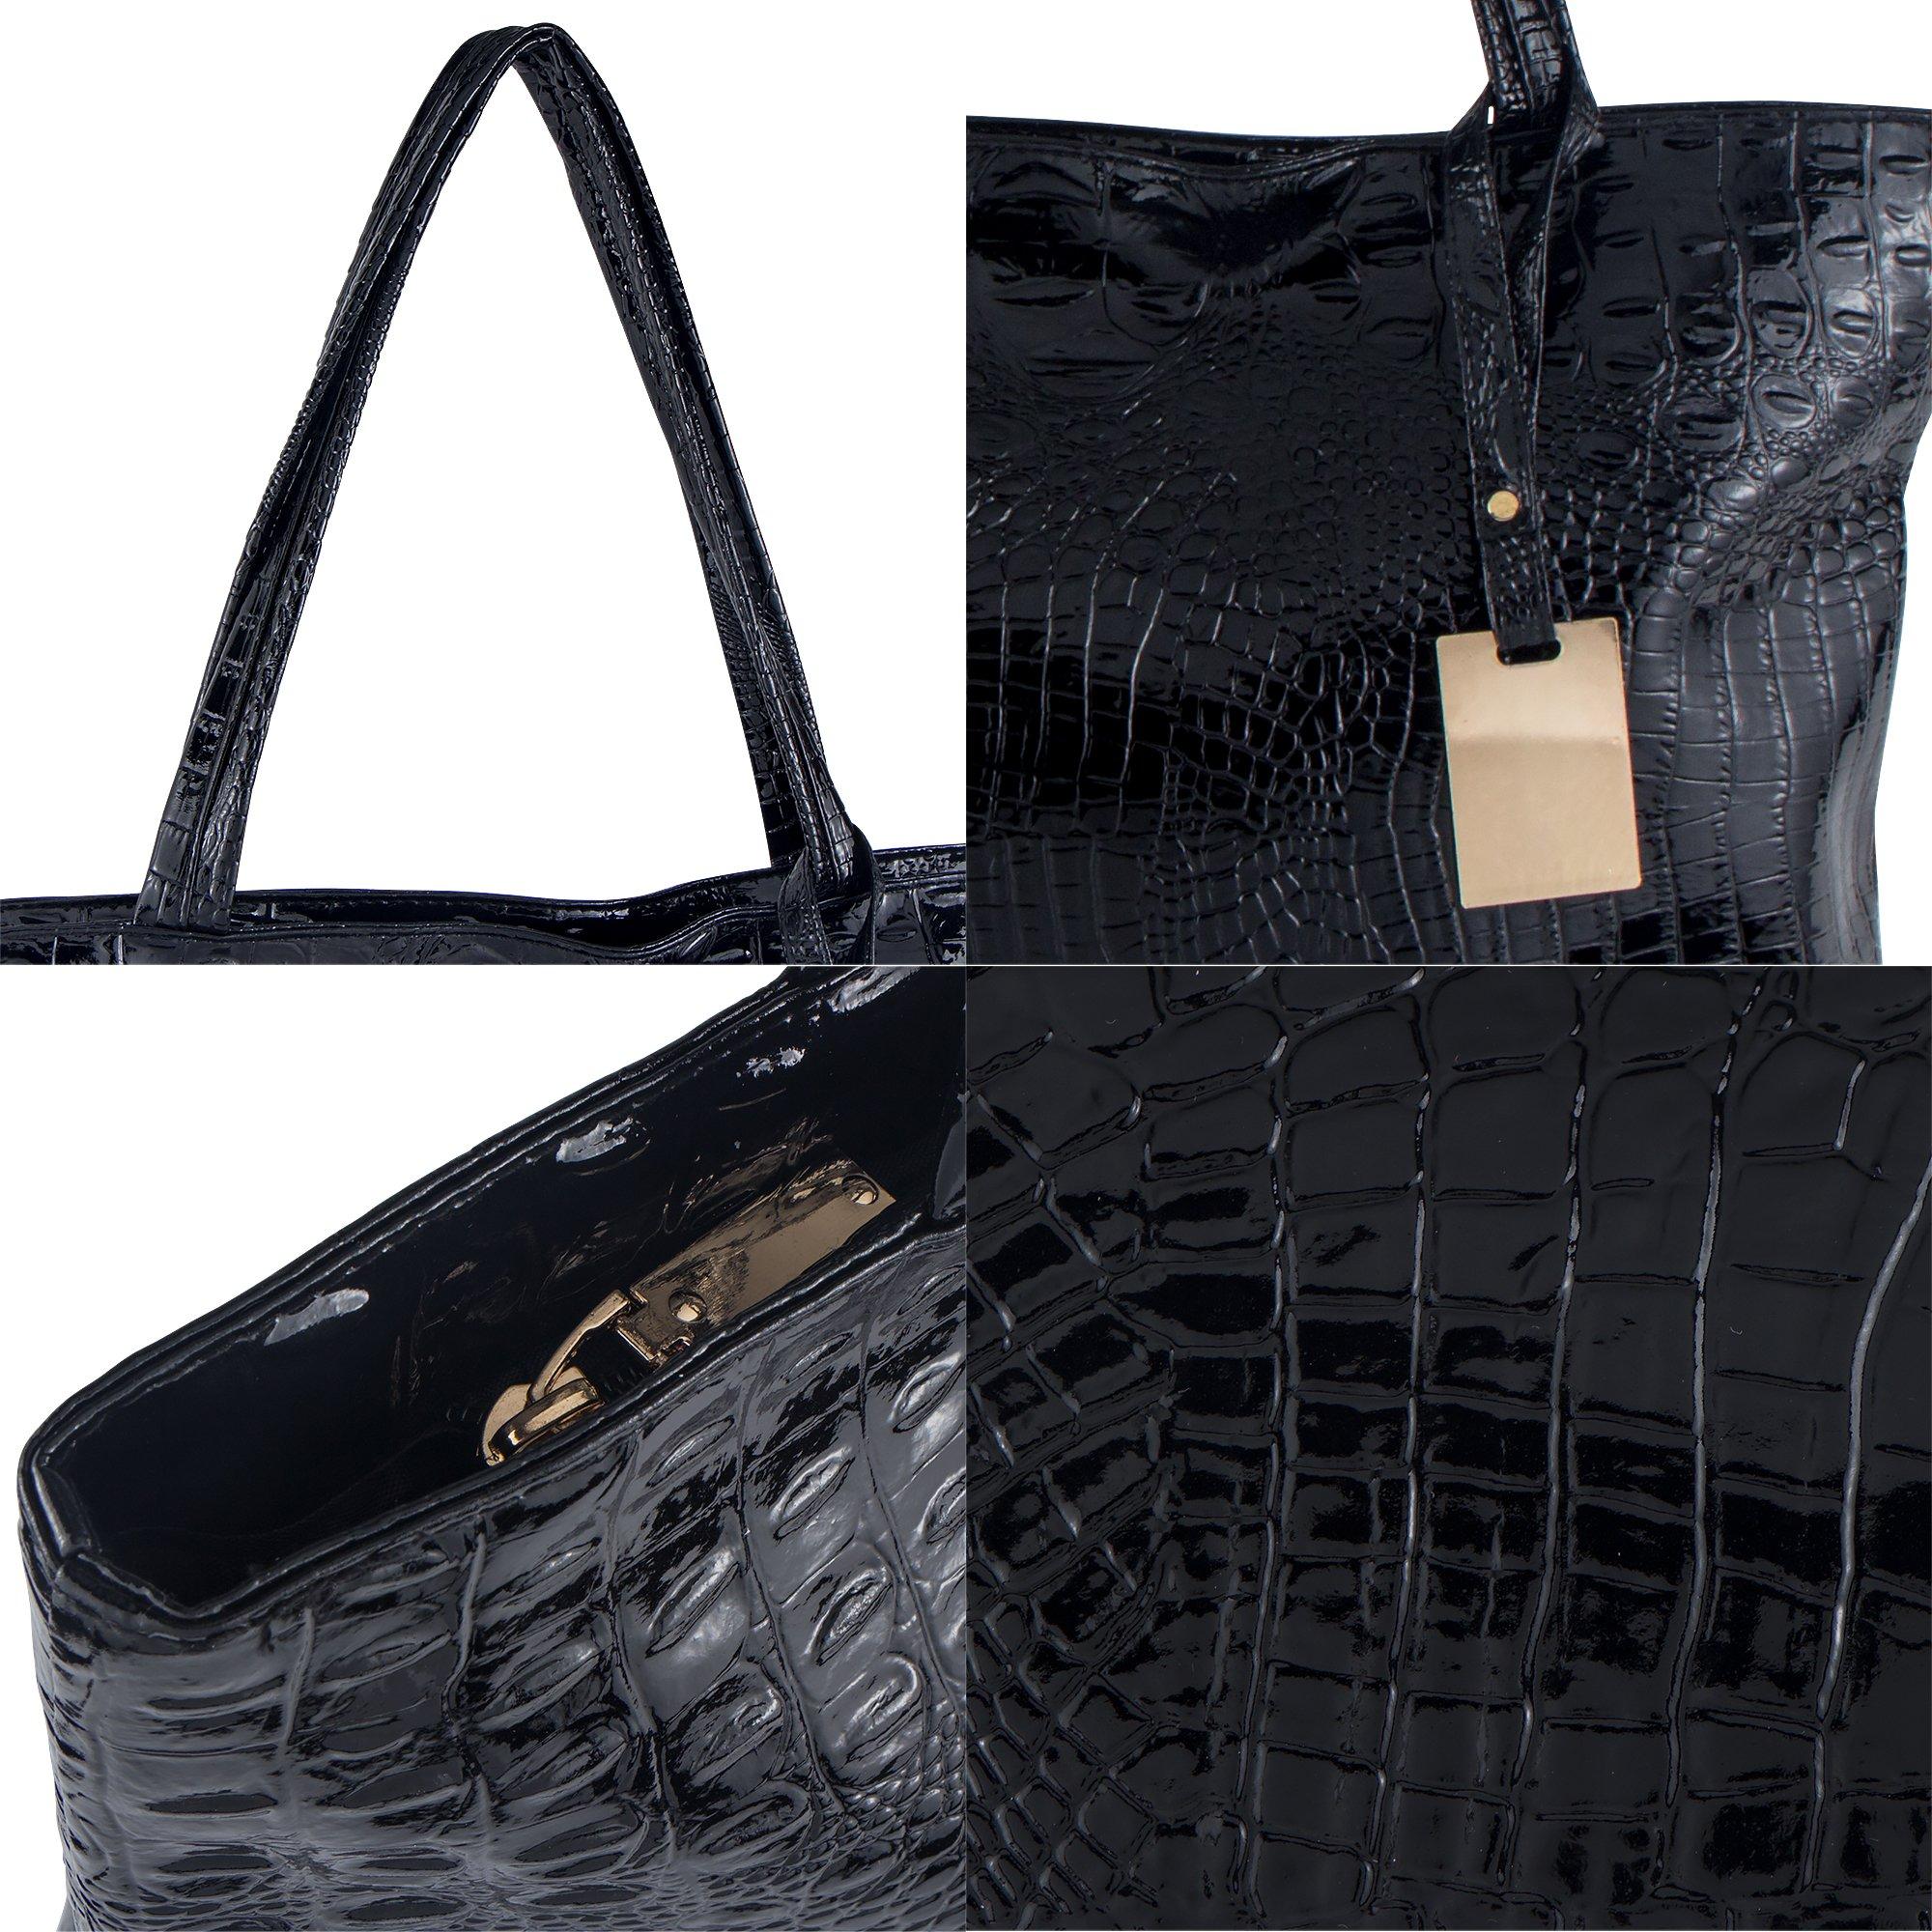 Bagood Womens Crocodile Pattern PU Leather Casual Shopping Handbags High Capacity Shoulder Ladies Soft Bag for Wedding Bridal Prom Party Black by Bagood (Image #5)